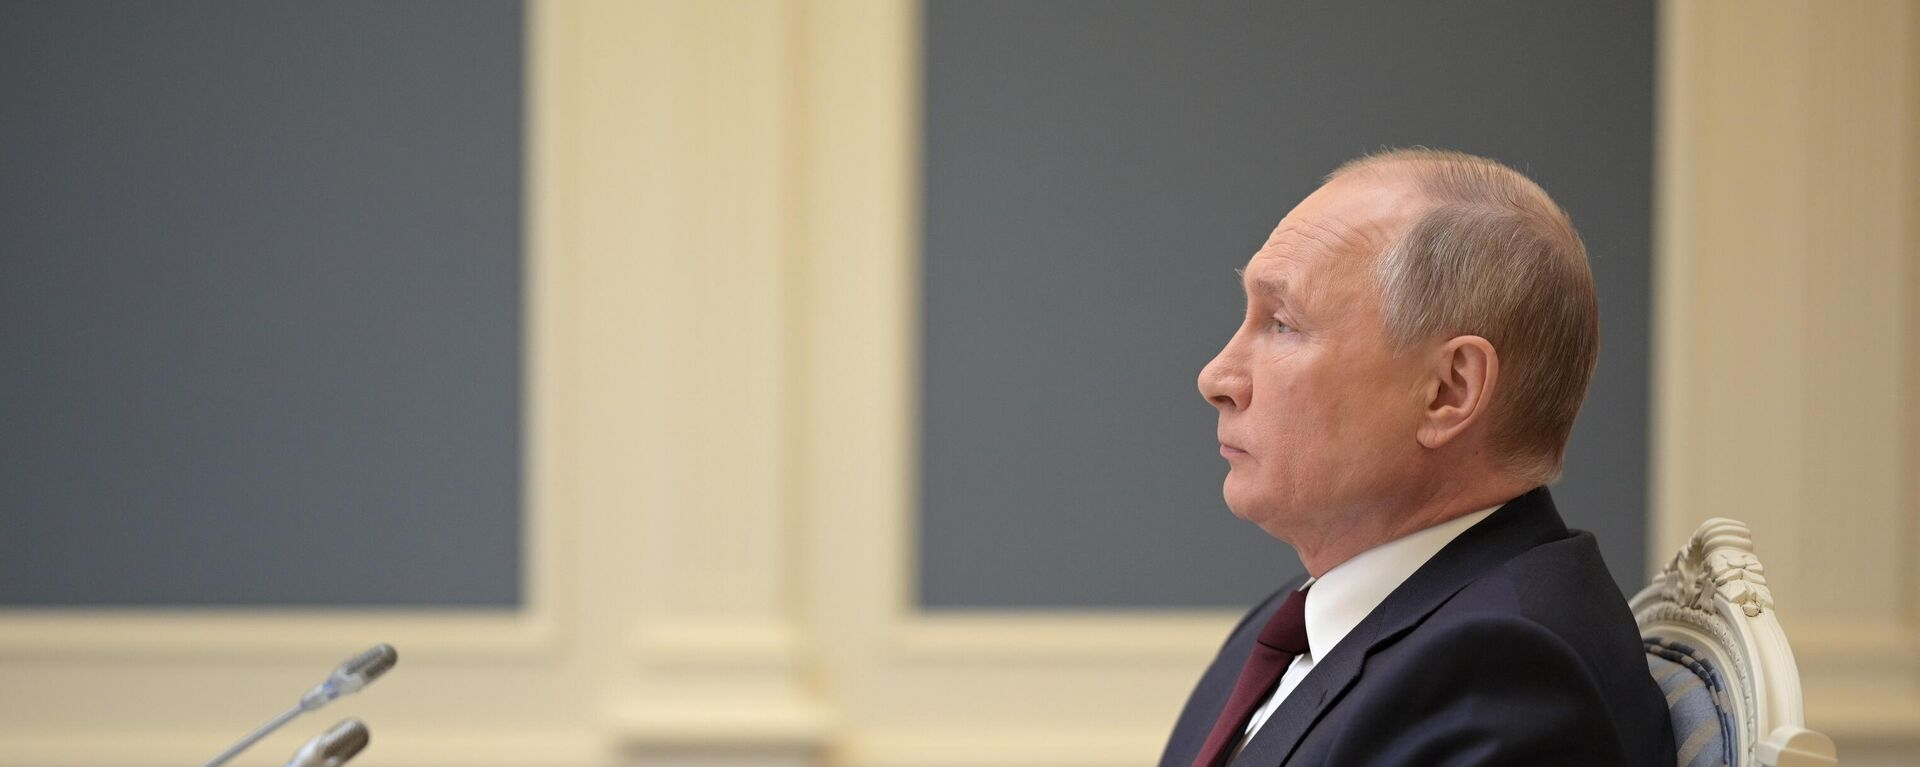 Vladímir Putin, presidente de Rusia - Sputnik Mundo, 1920, 08.06.2021